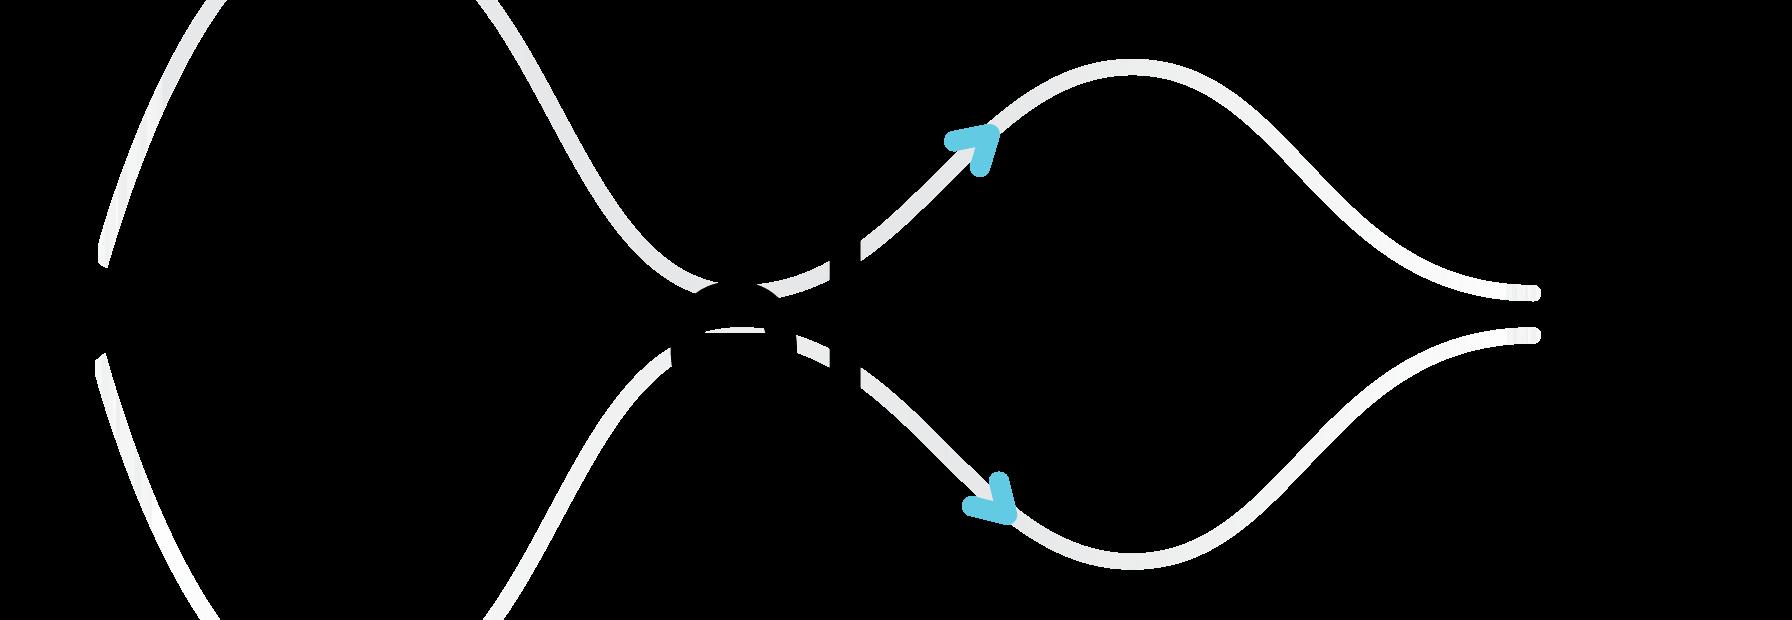 DevelopHeader-2